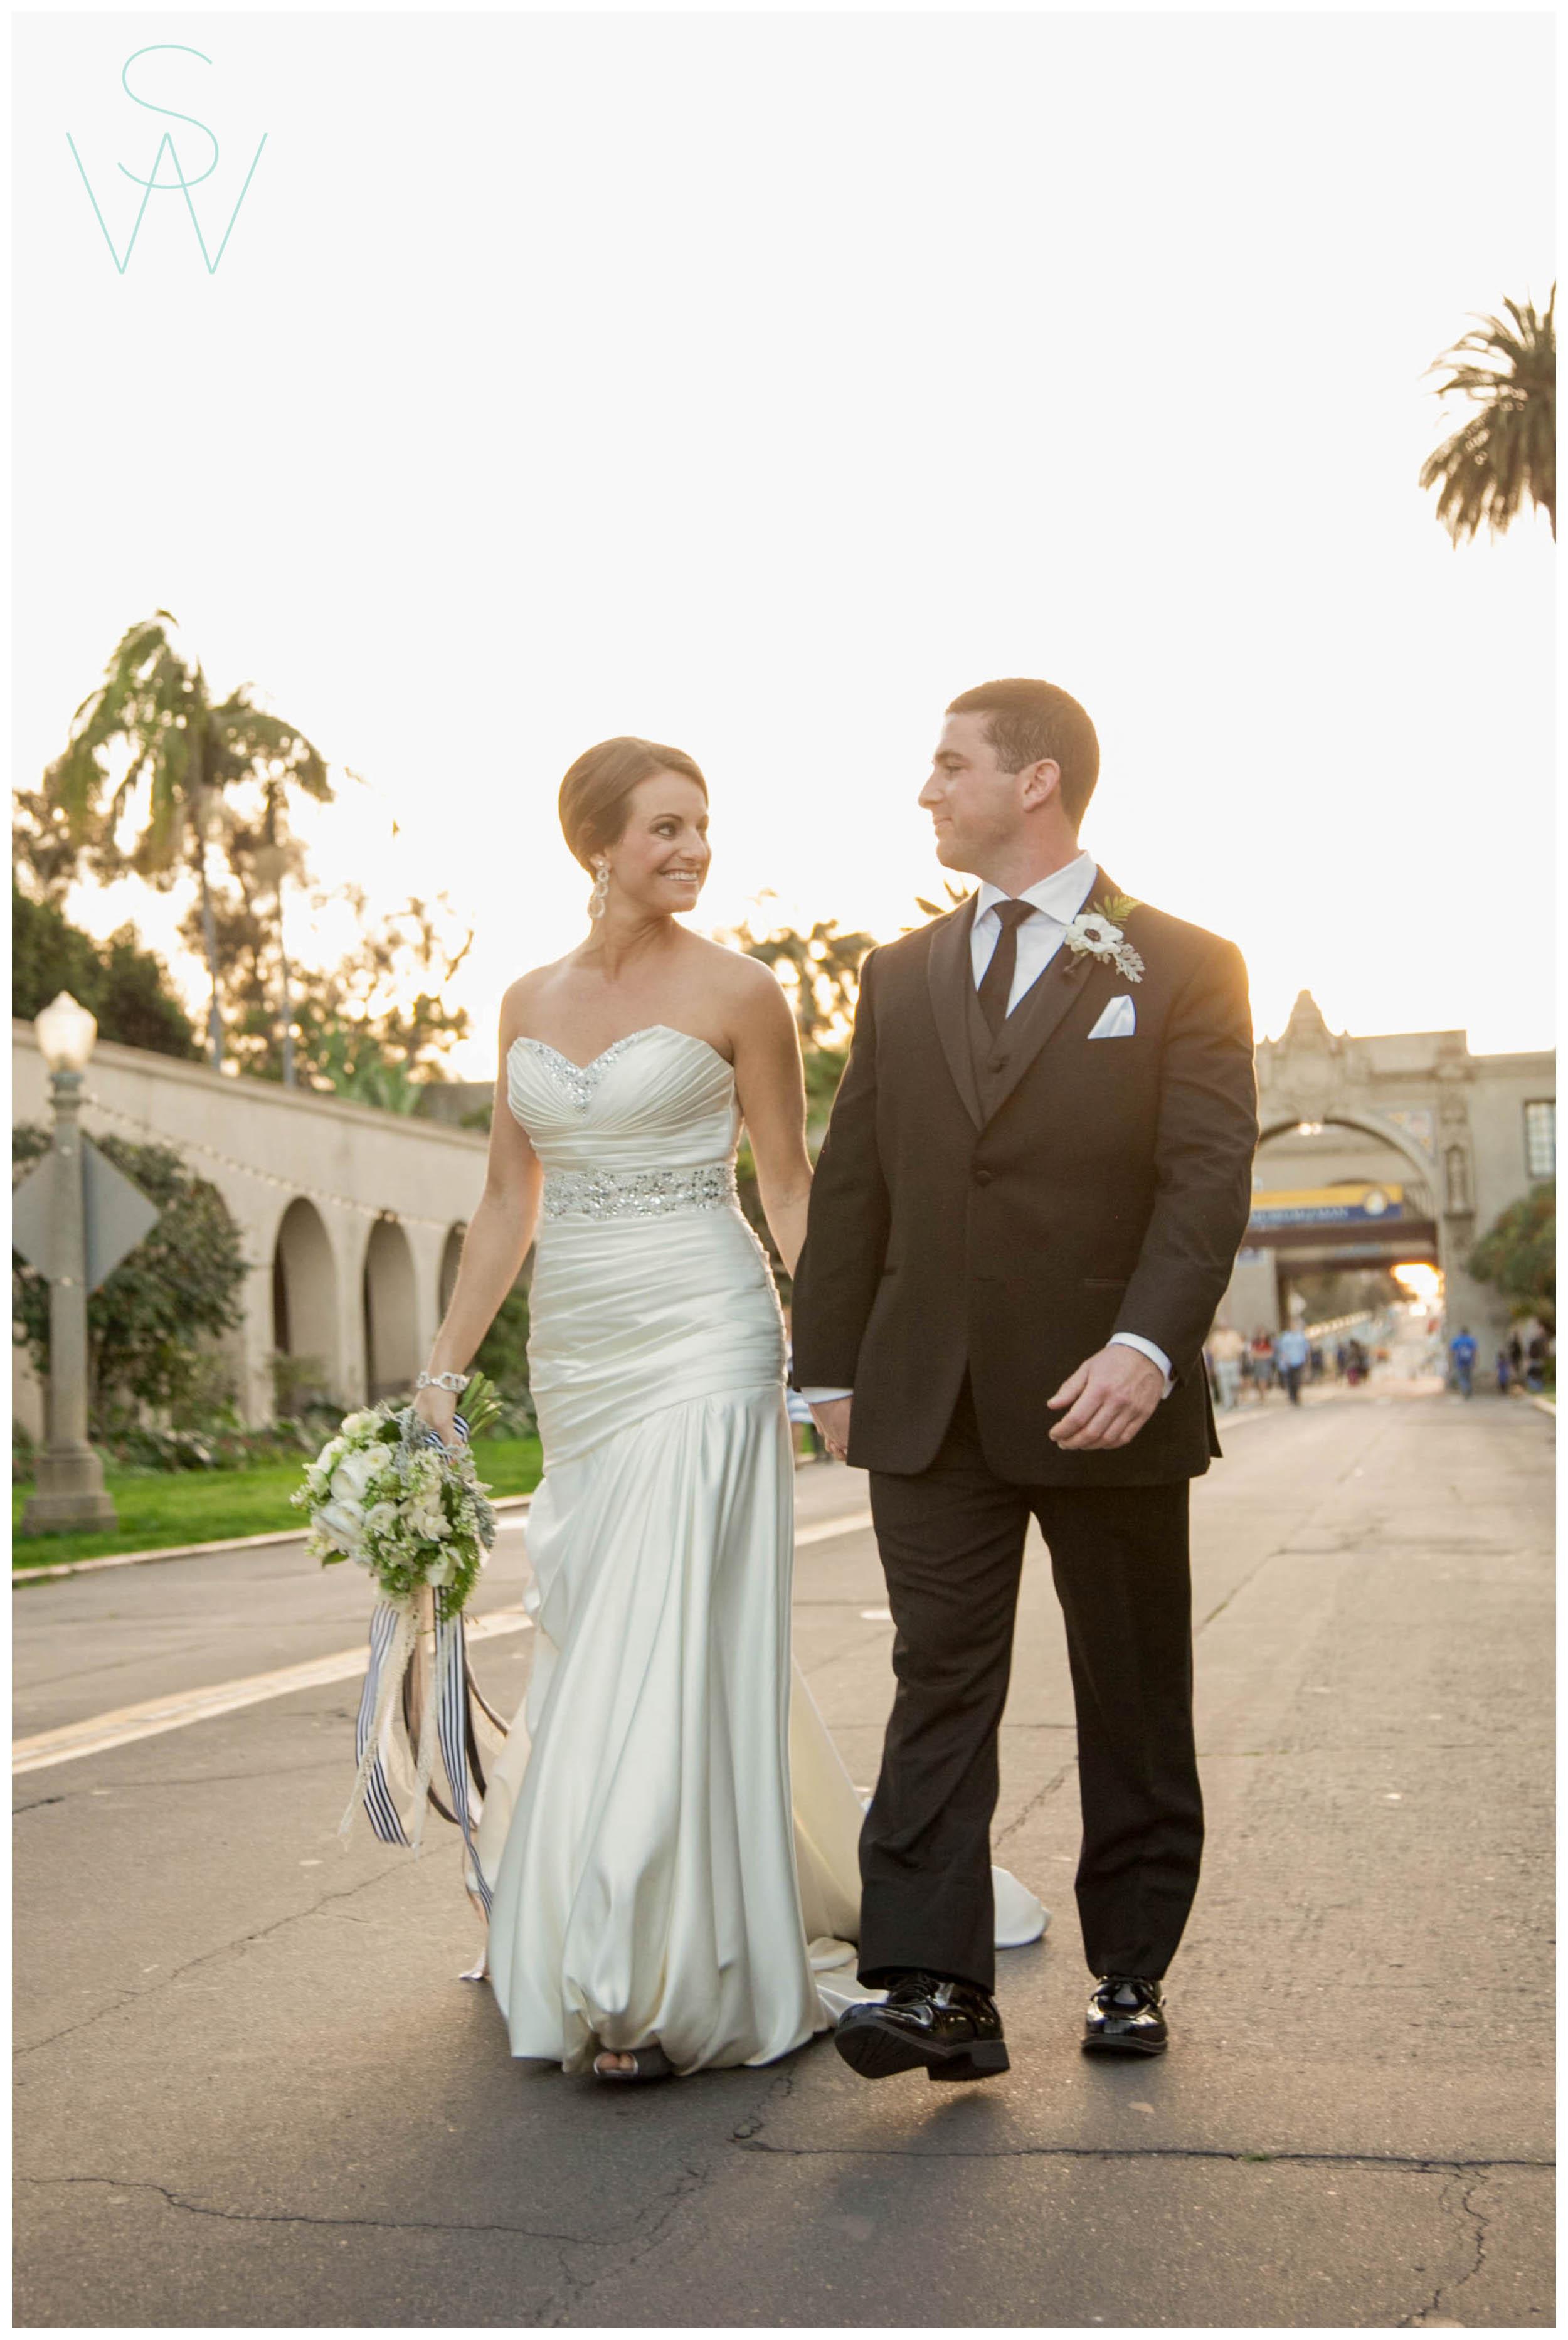 Shewanders.sdma_.wedding.photography-1039.jpg.wedding.photography-1039.jpg